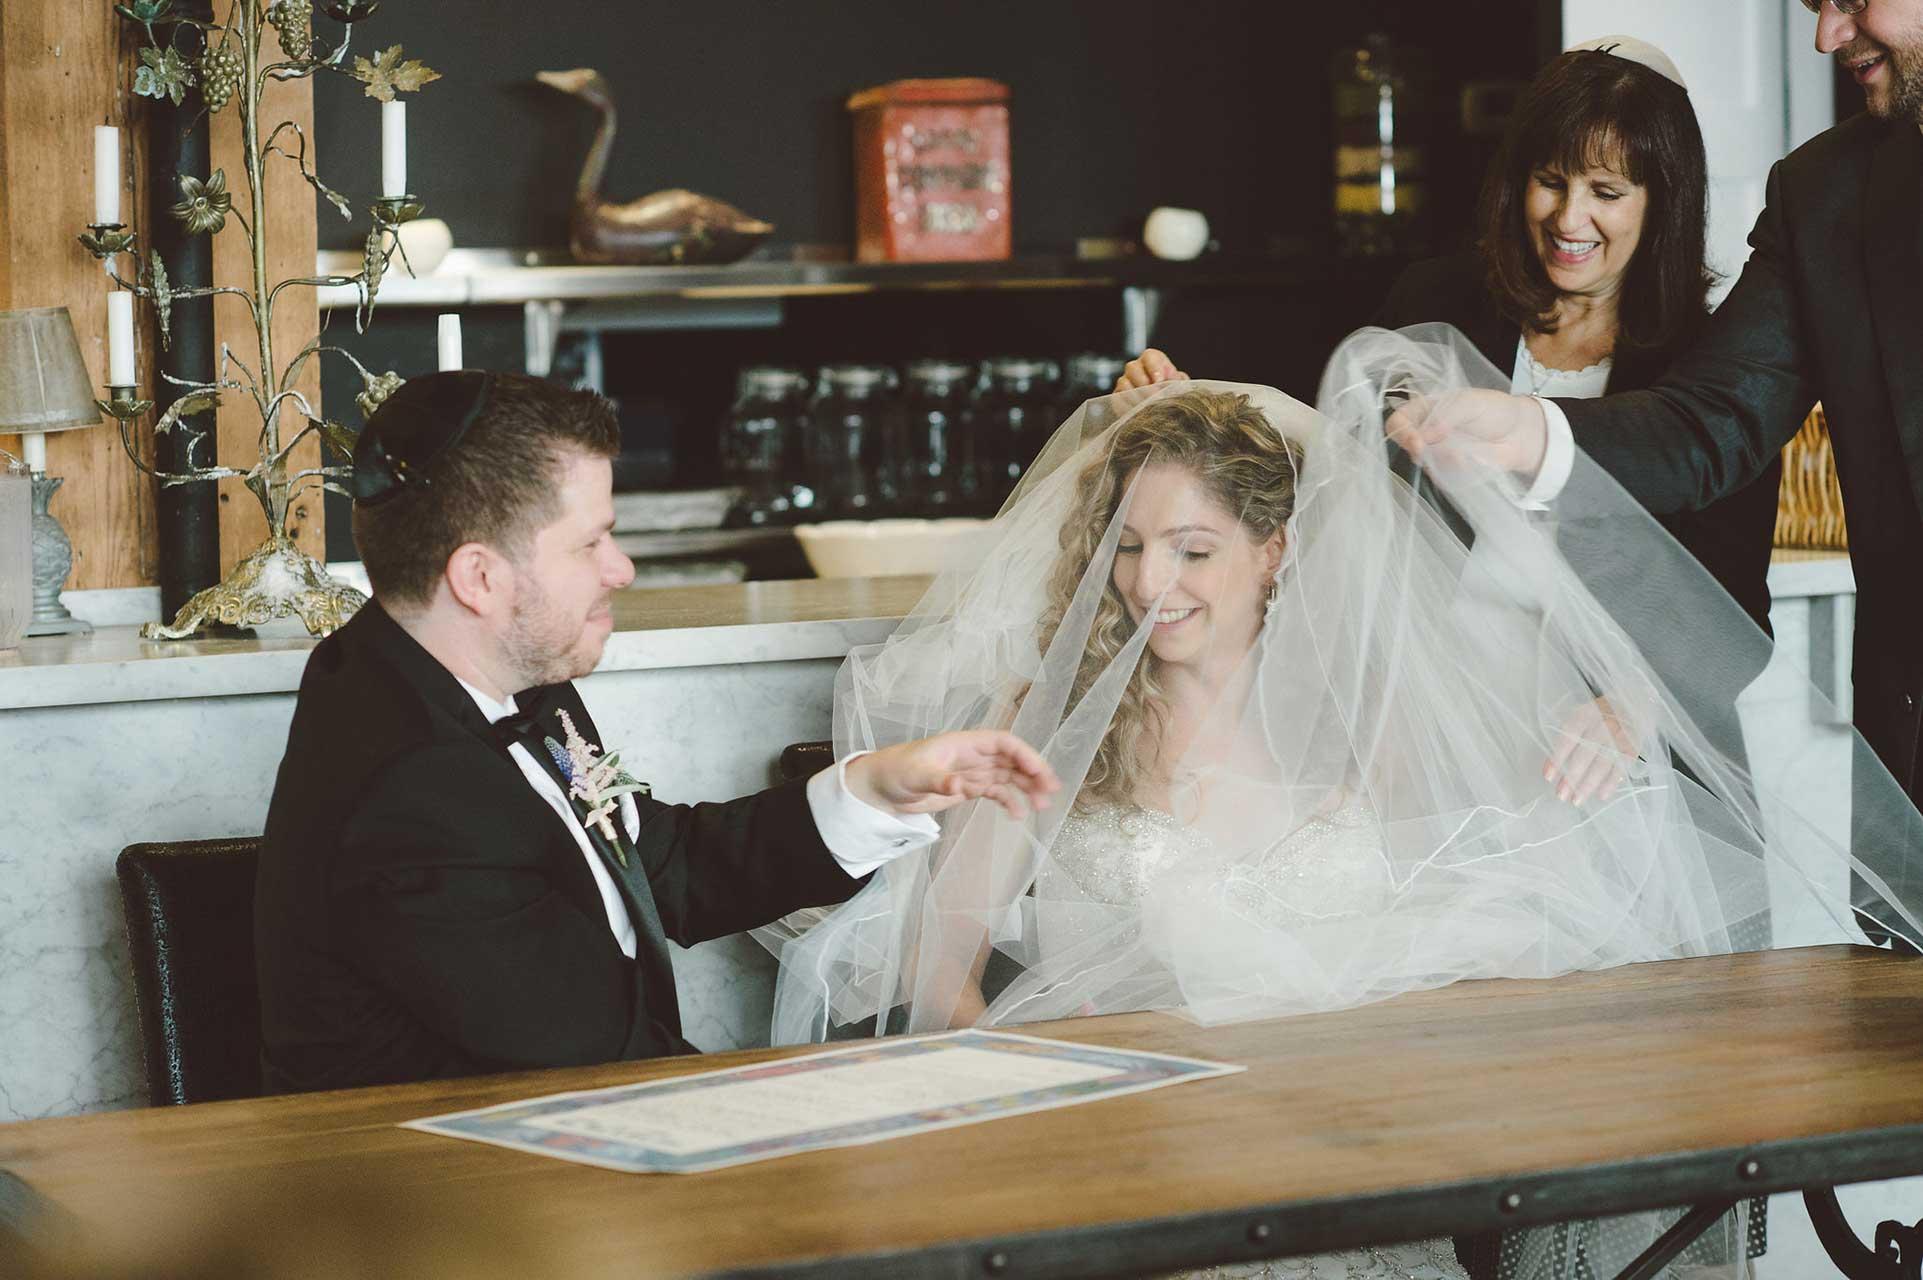 Wedding Venues Toronto - Jewish Wedding Ceremony - Intimate Wedding